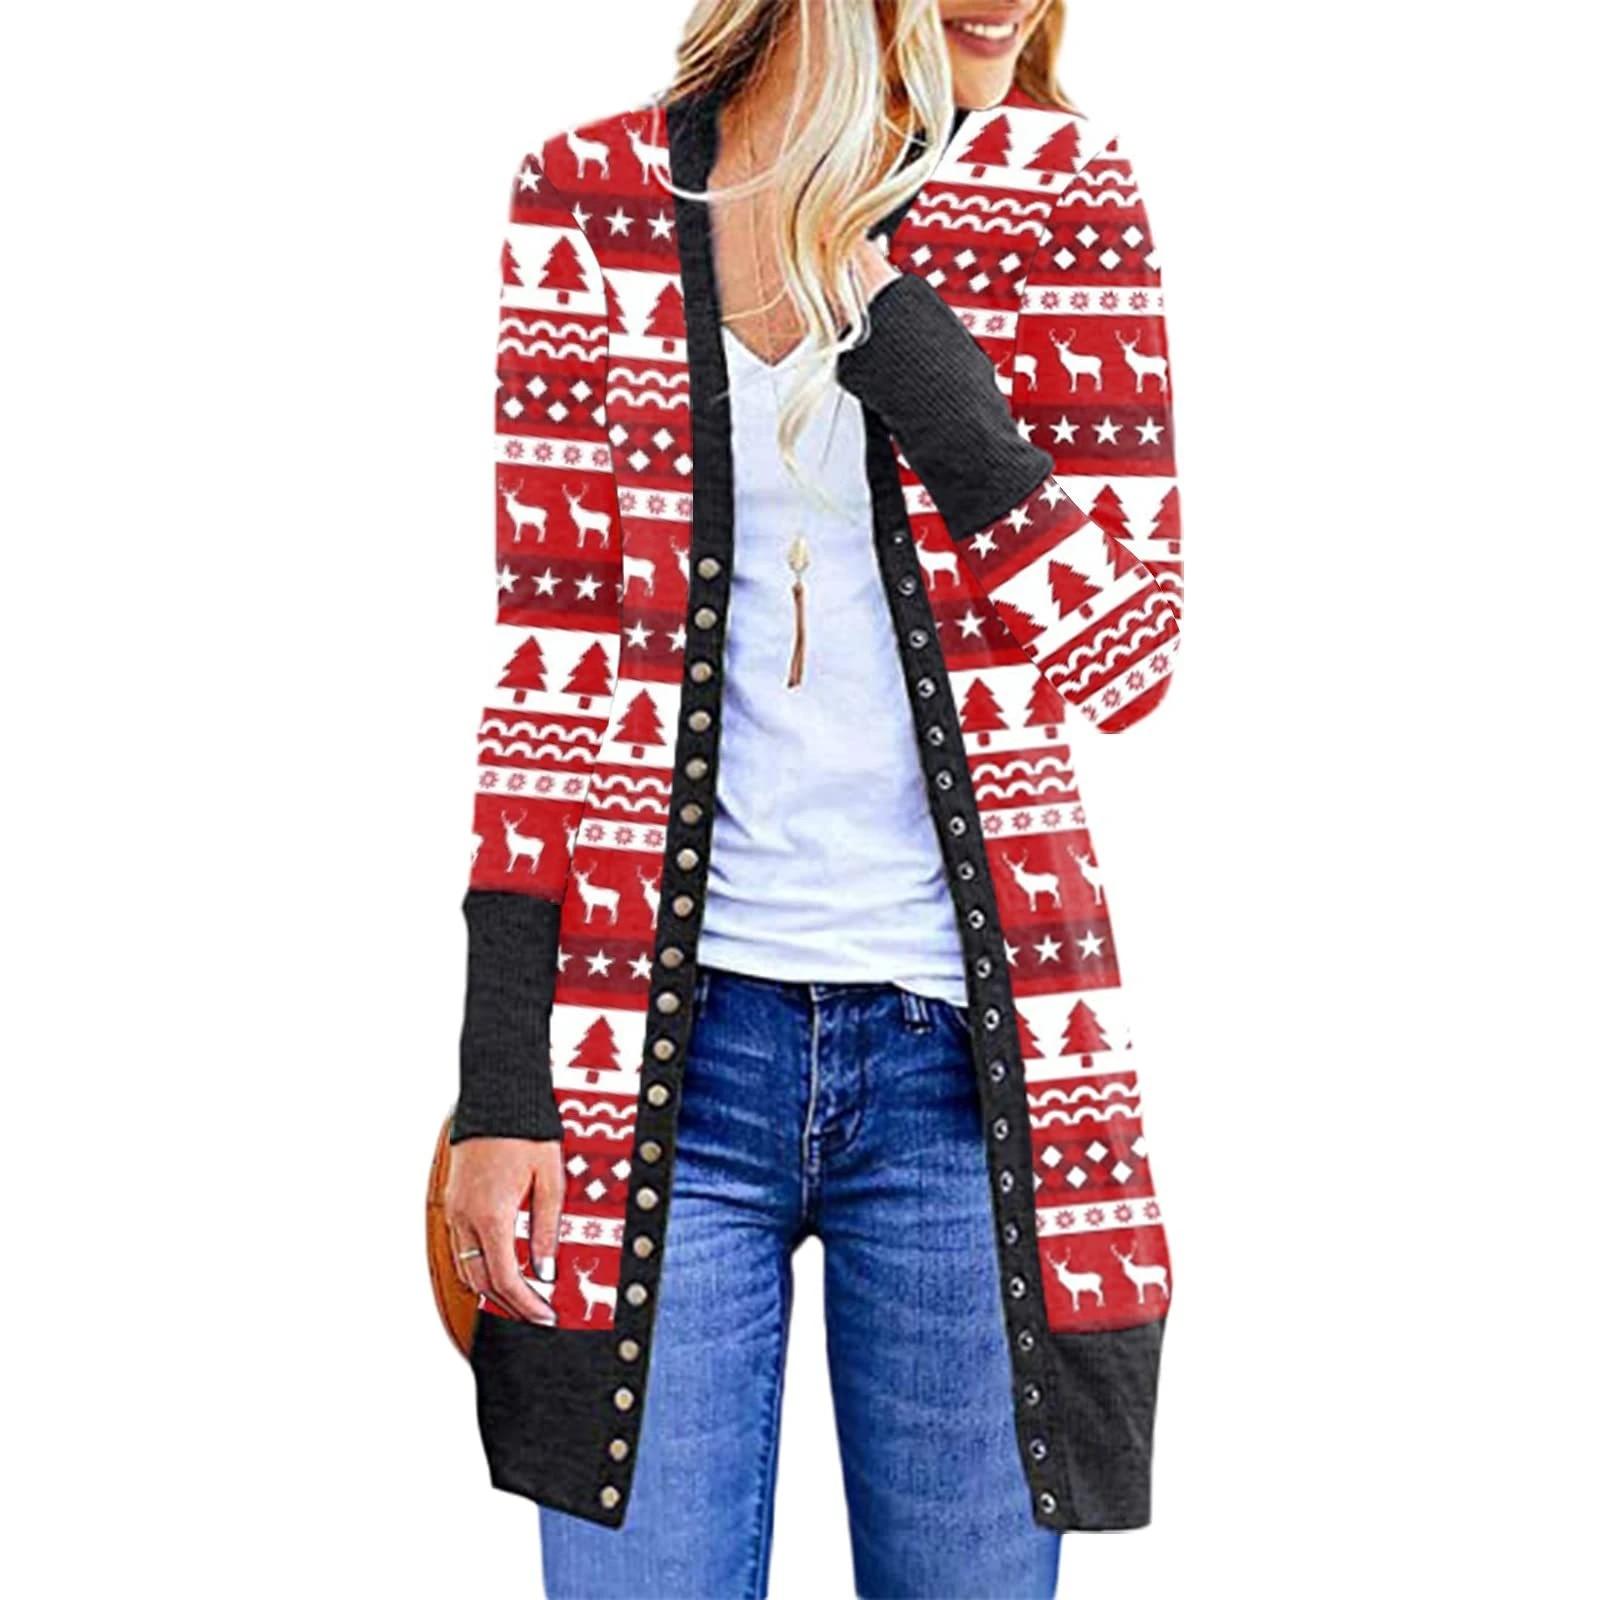 Women's Christmas Cardigan Fashionable Snowman Deer Printing ...